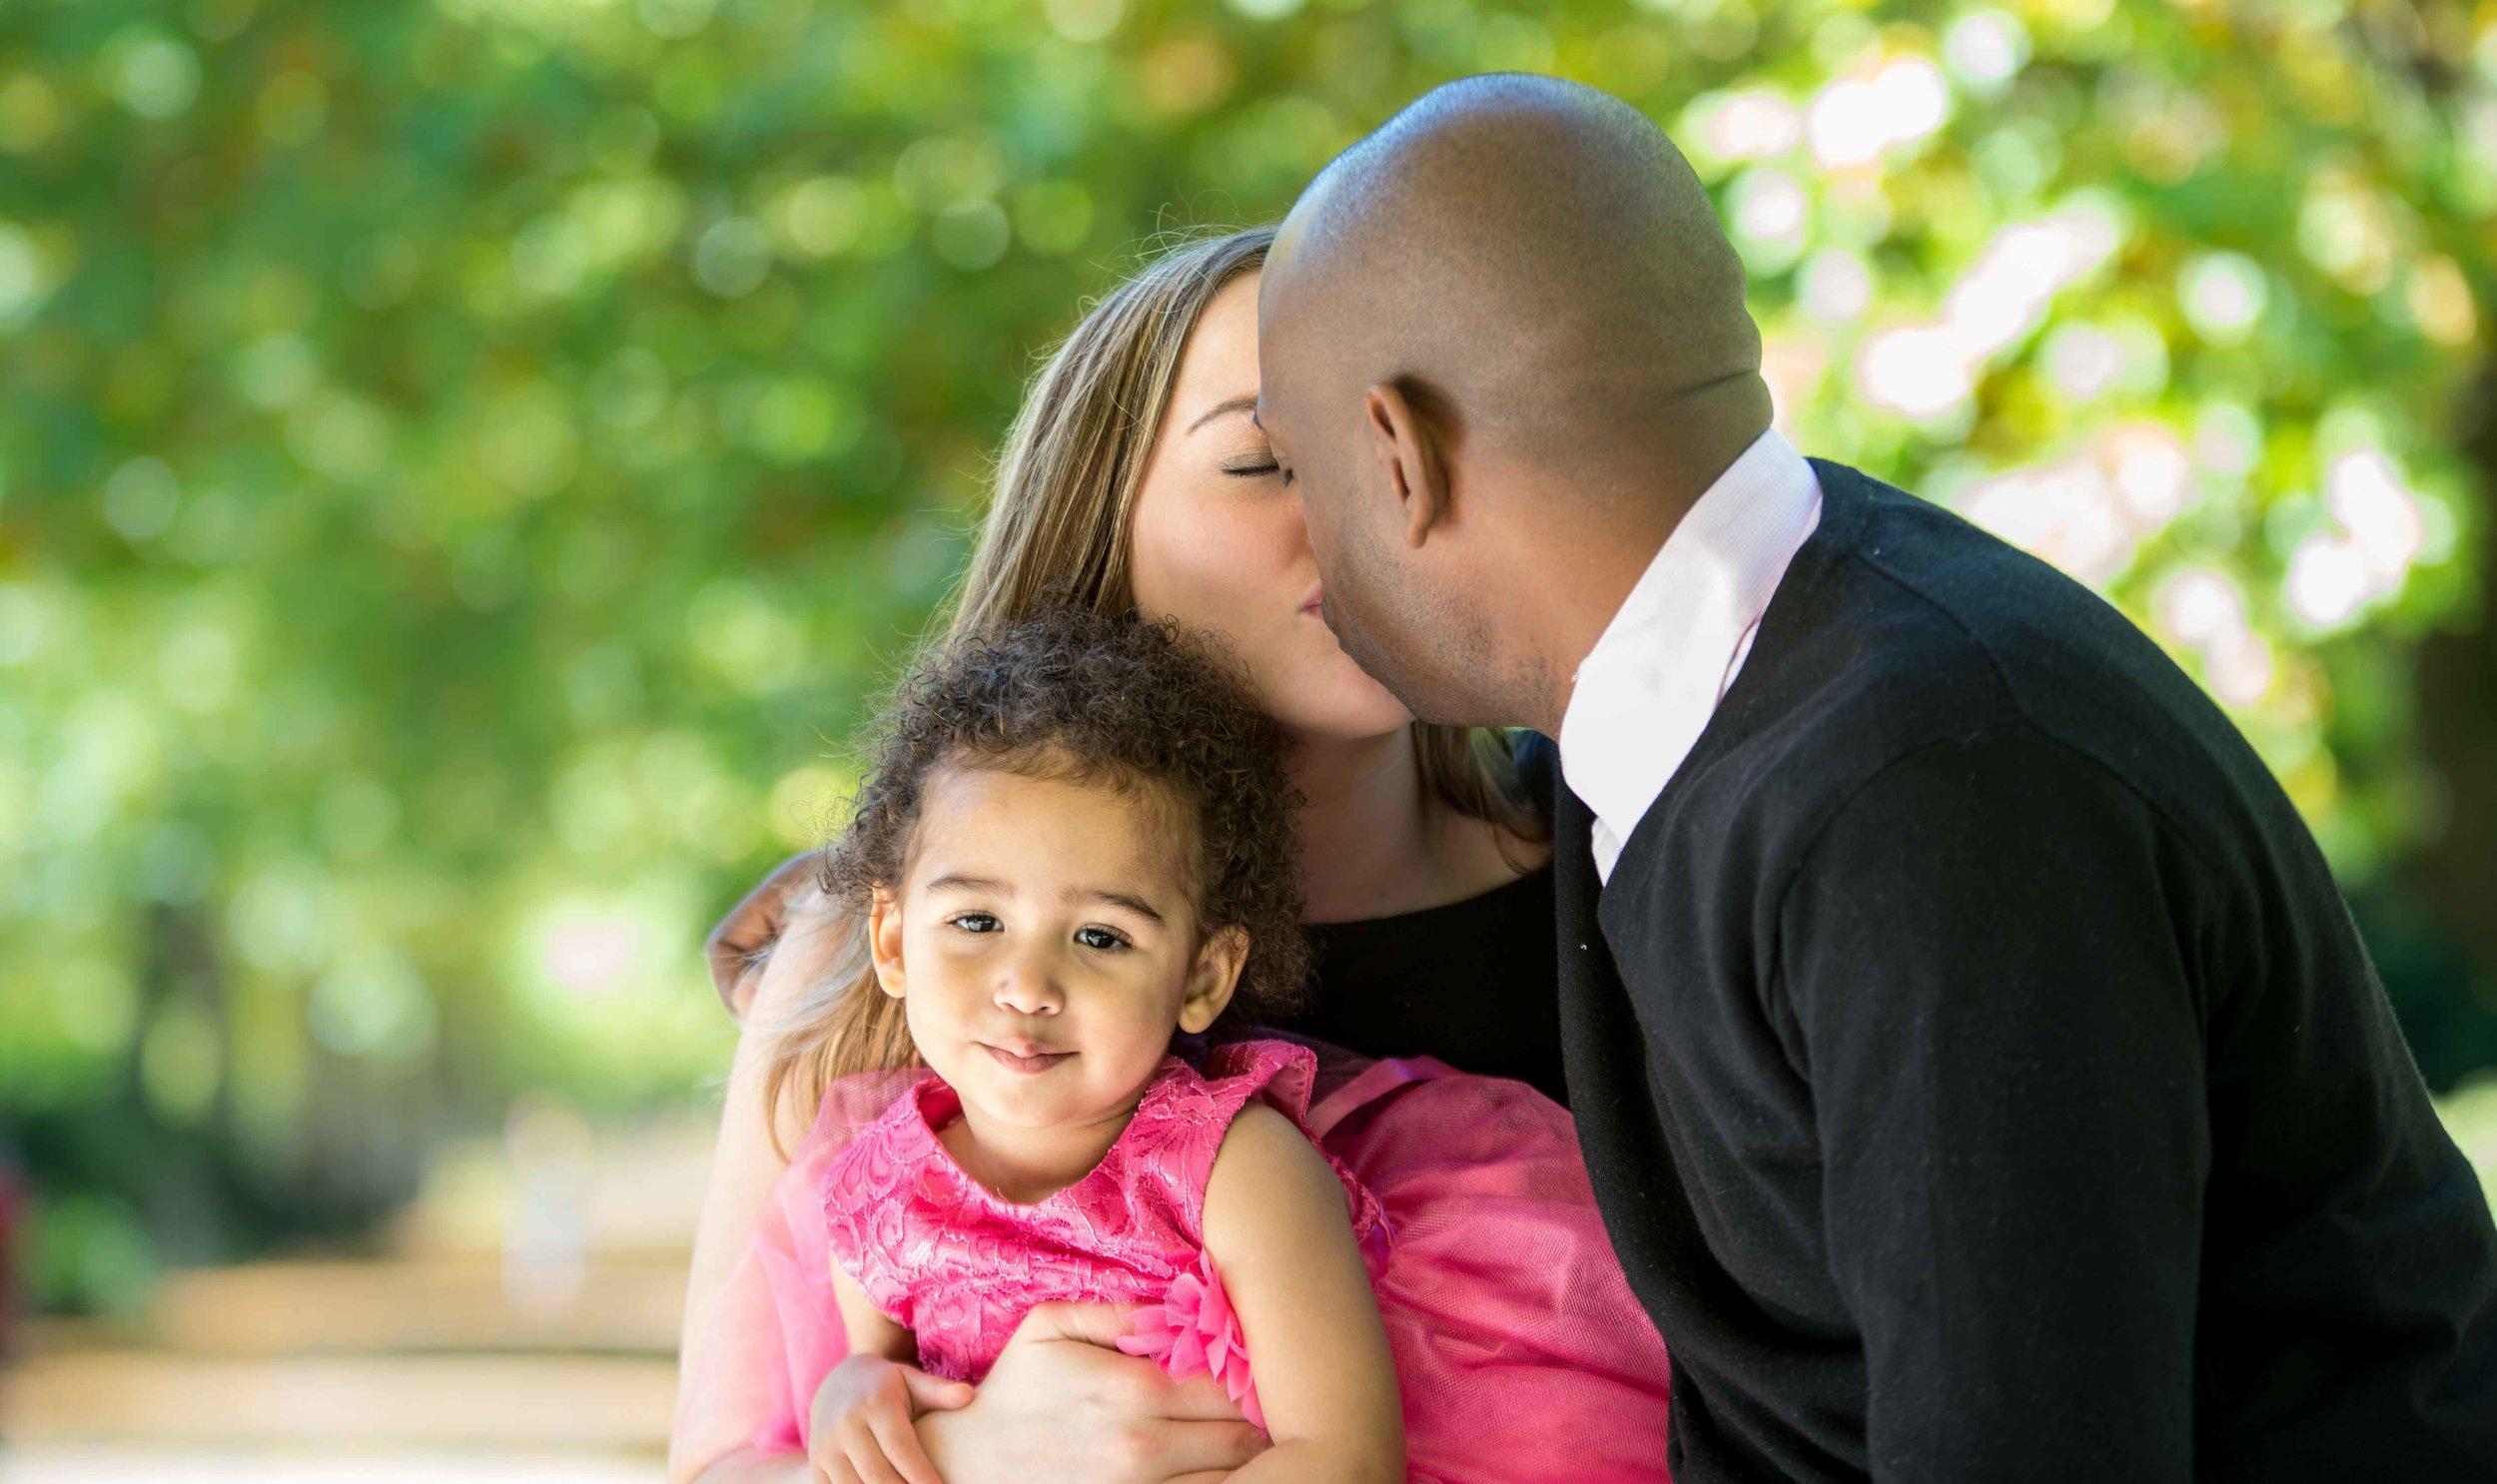 OUTDOOR FAMILY PORTAIT SESSION IN LONDON & BRIGHTON -